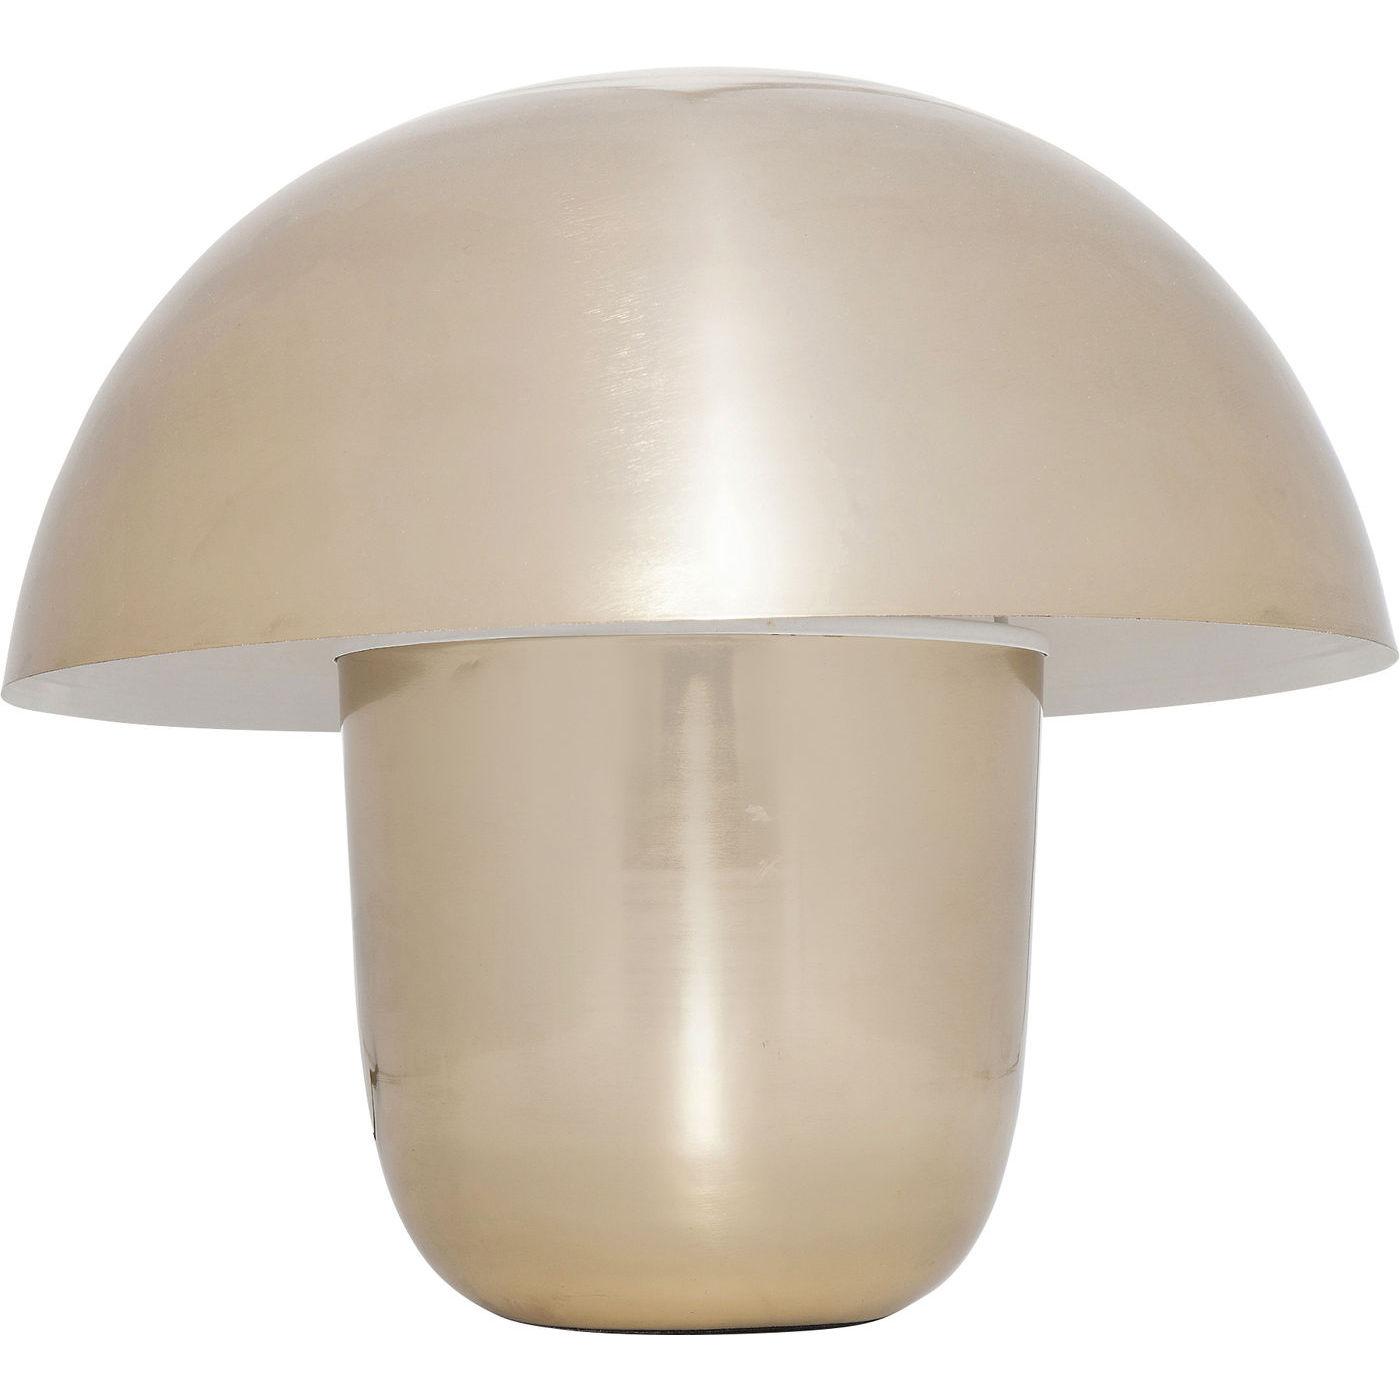 Kare design mushroom gold small bordlampe - guld stål fra kare design på boboonline.dk